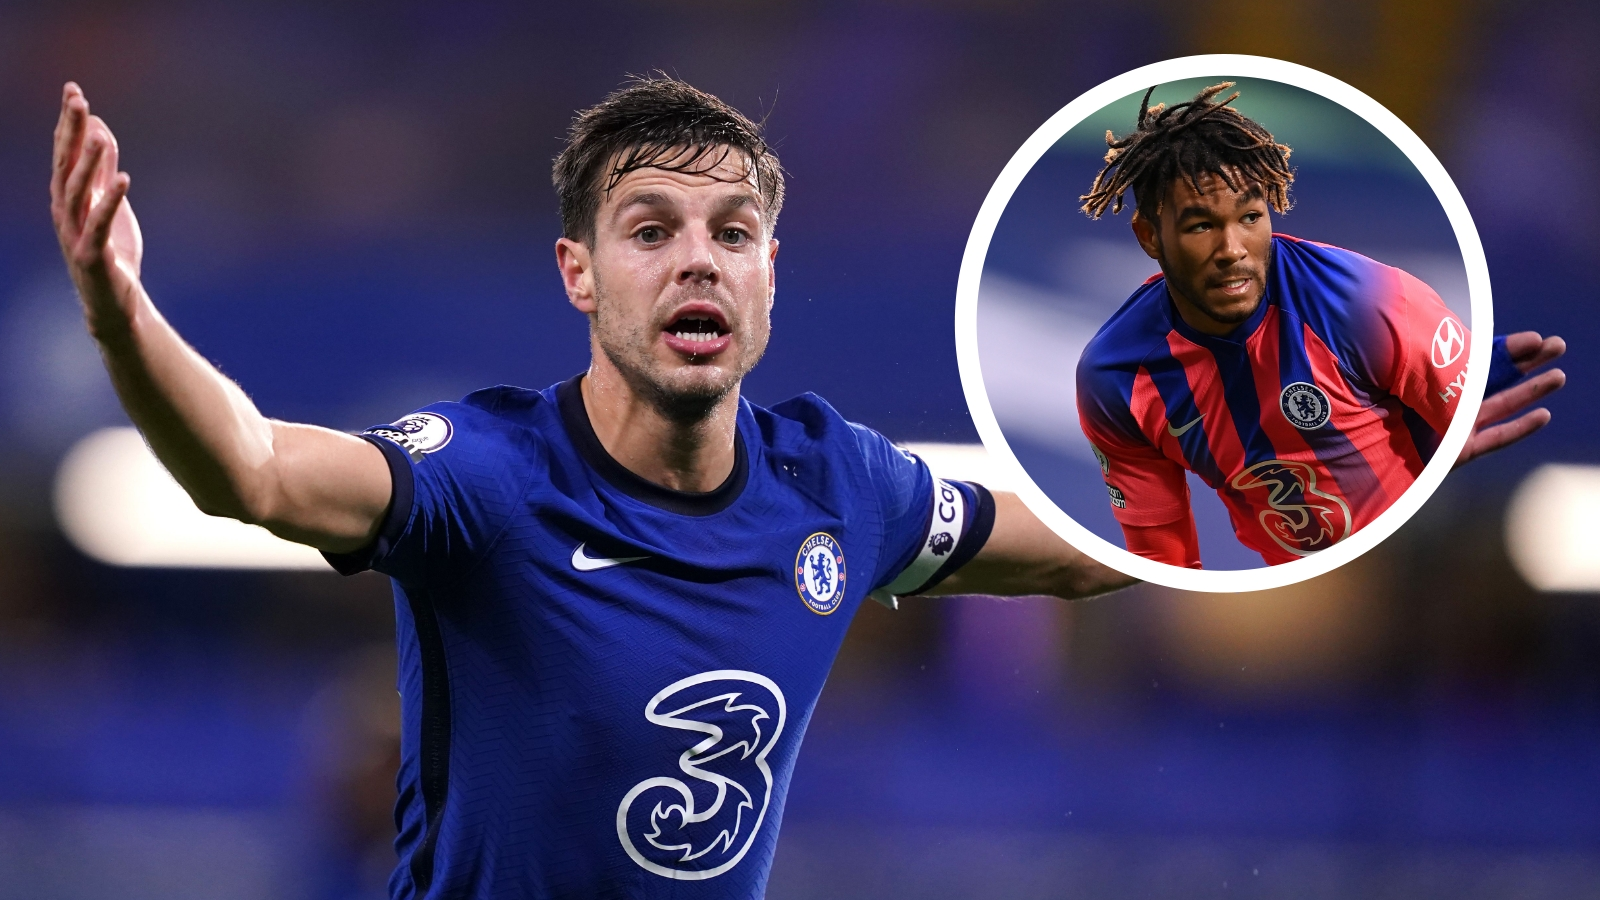 Azpilicueta eyes James' place after ending two-month Premier League exile at Chelsea